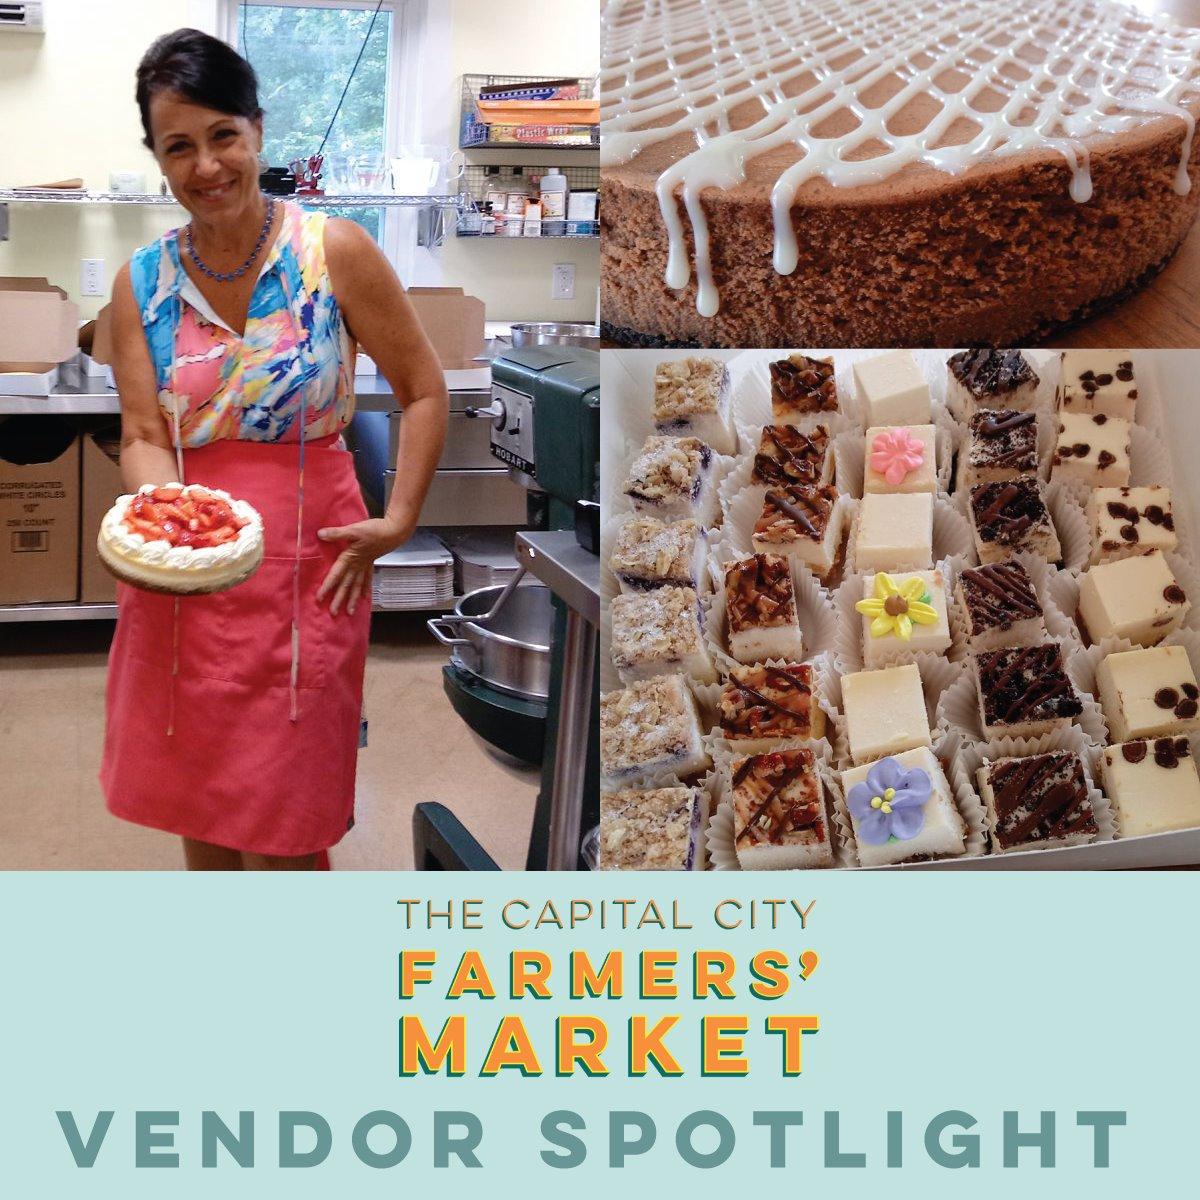 Capital City Farmers' Market - Vendor Spotlight